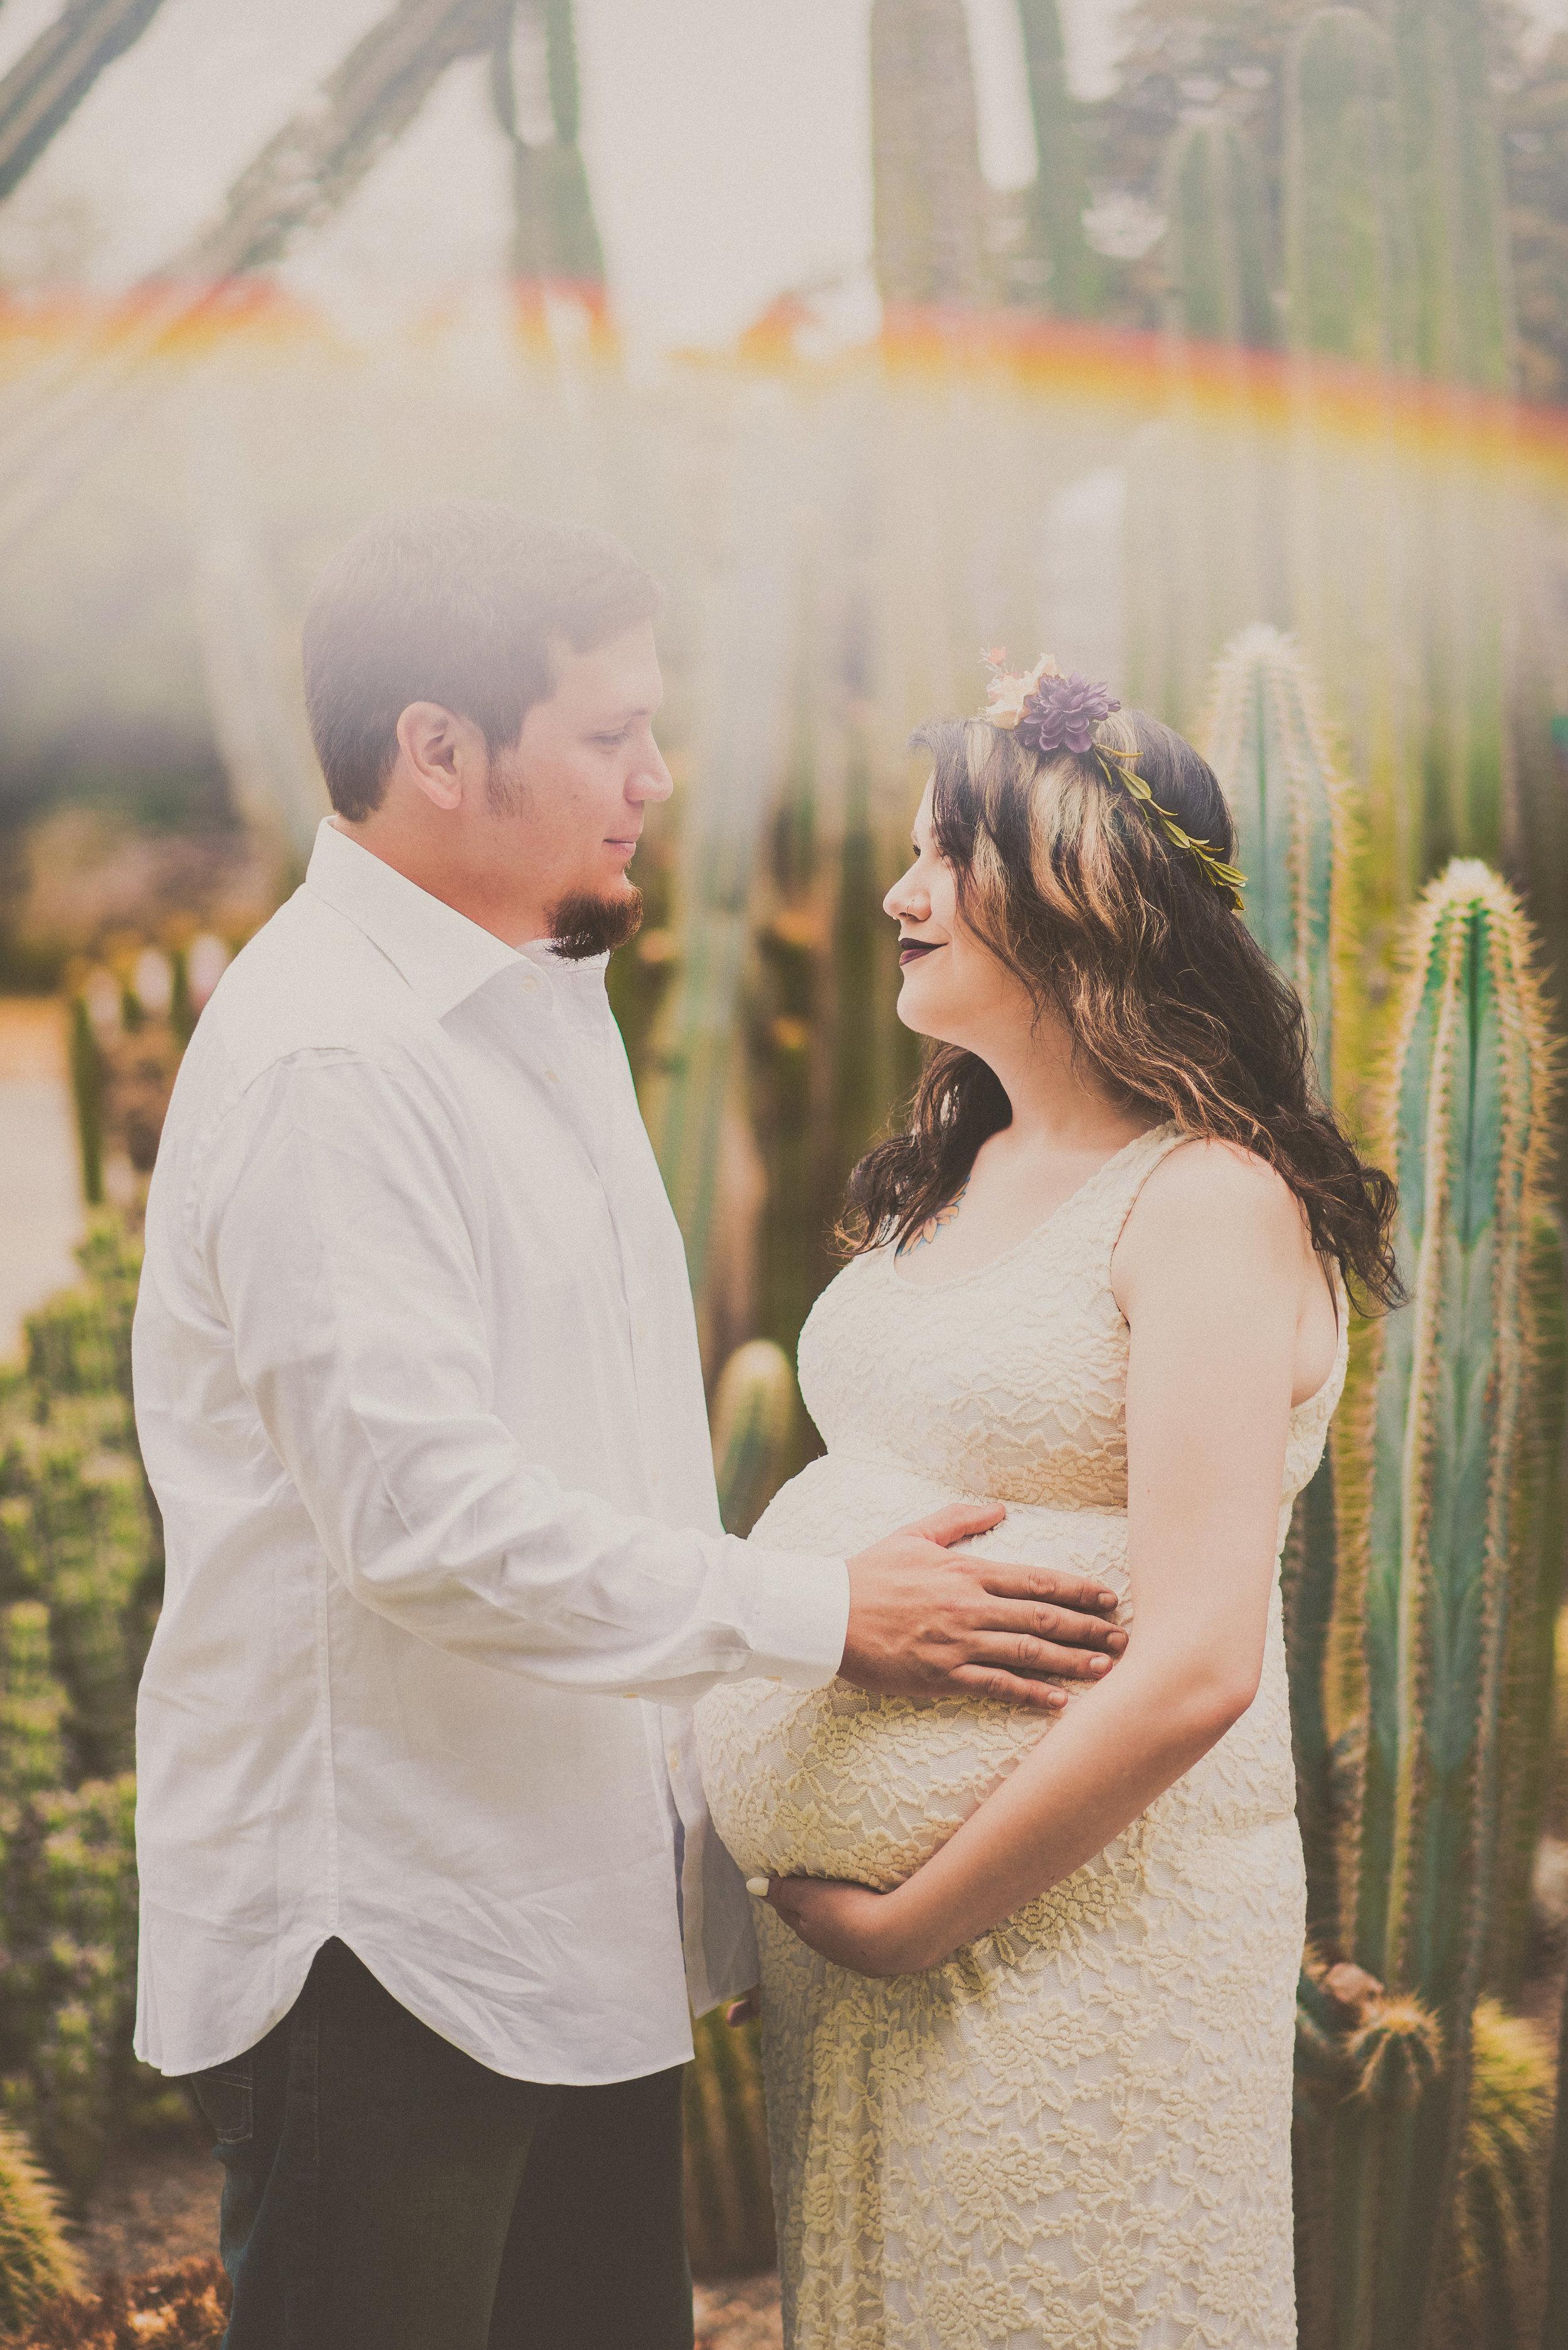 Mendez Maternity-20.jpg